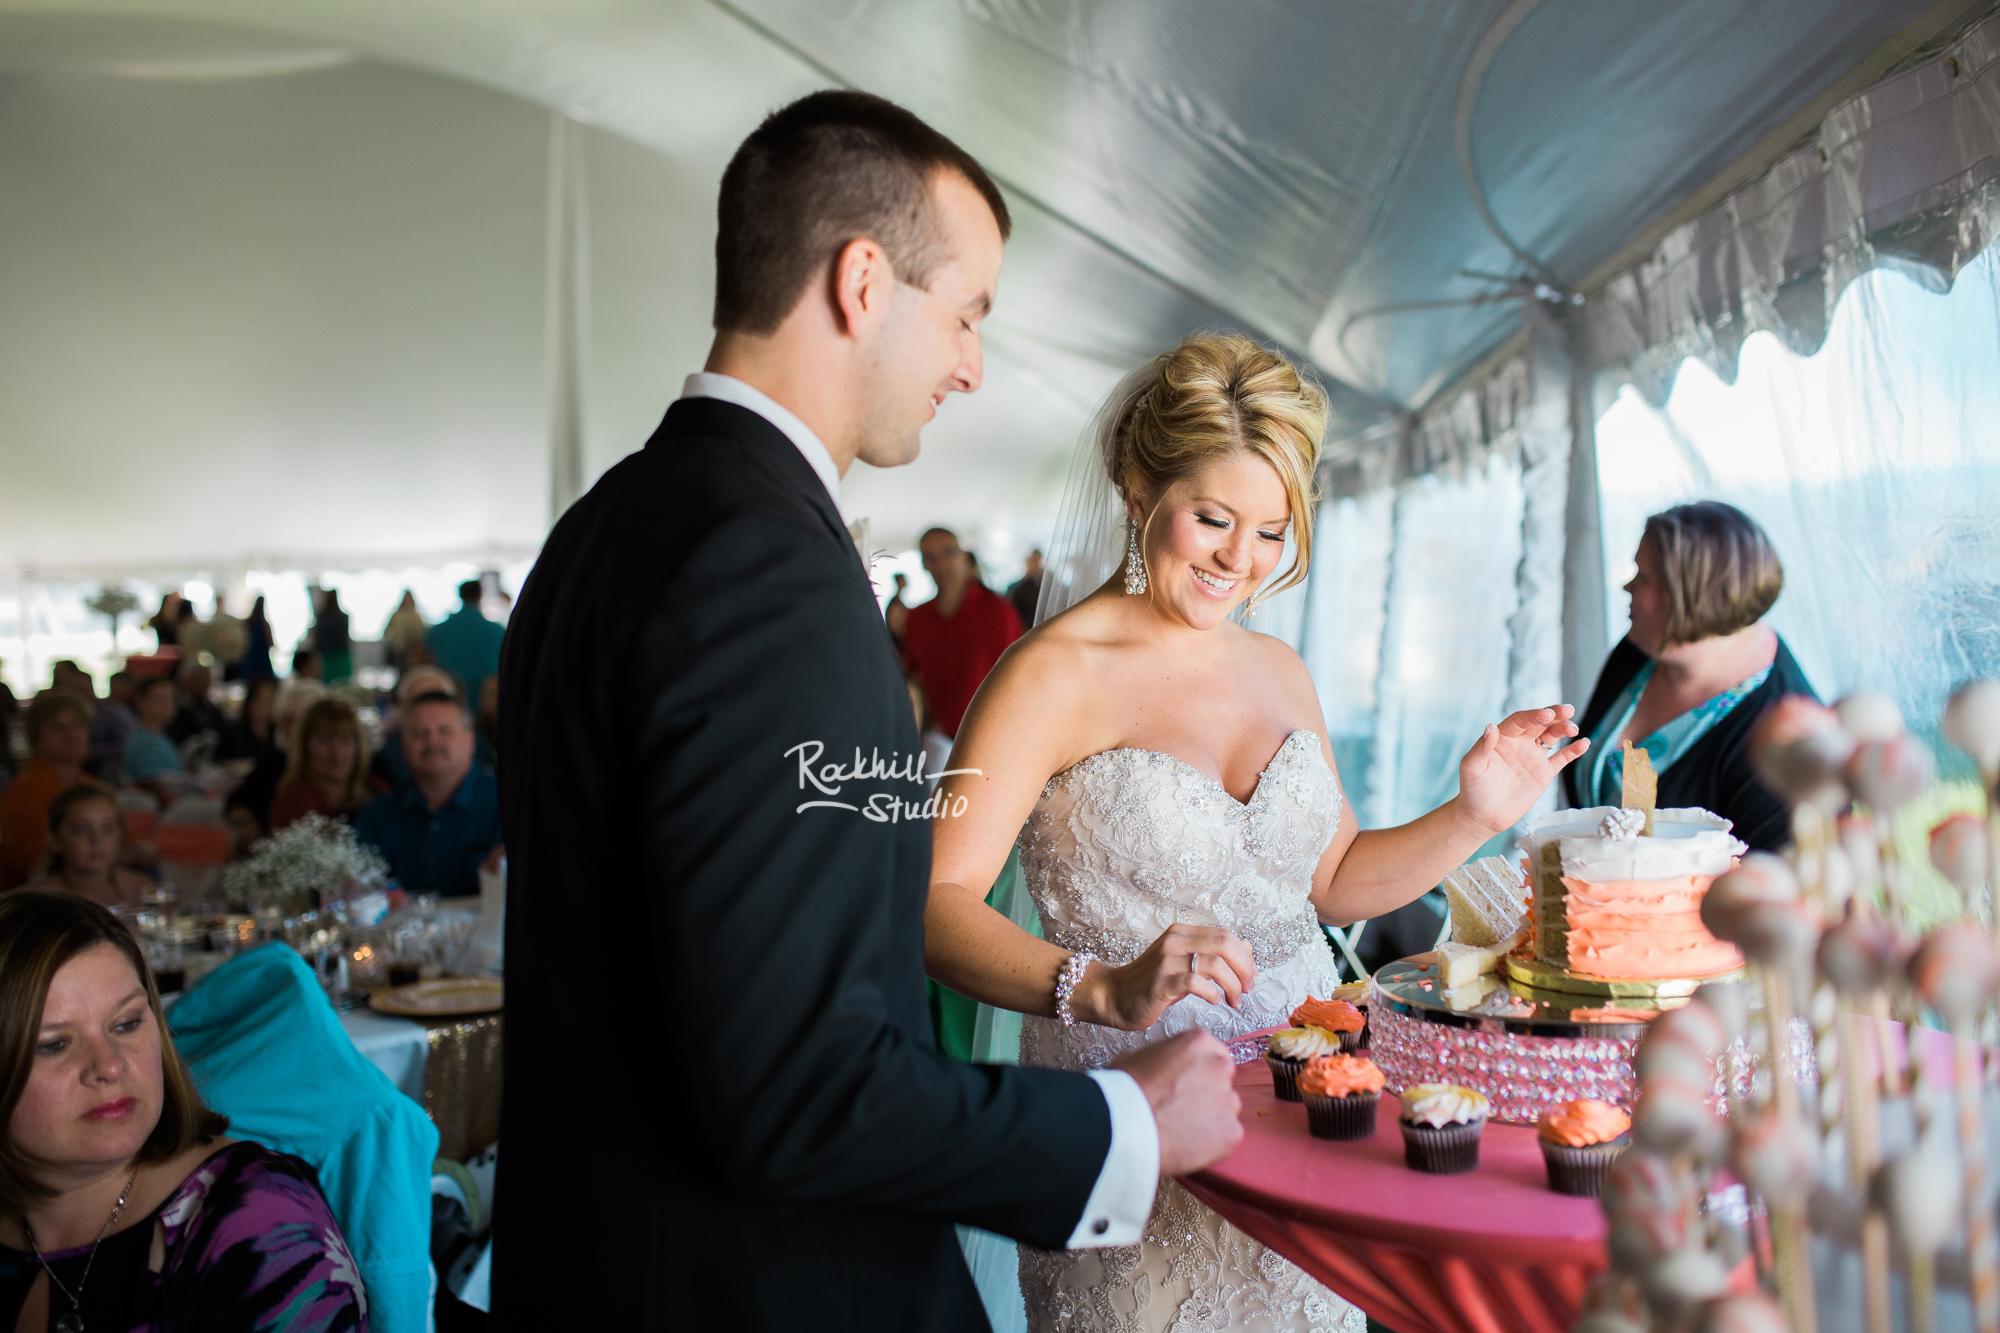 rockhill-studio-newberry-michigan-wedding-curtis-upper-peninsula-cake-cutting.jpg